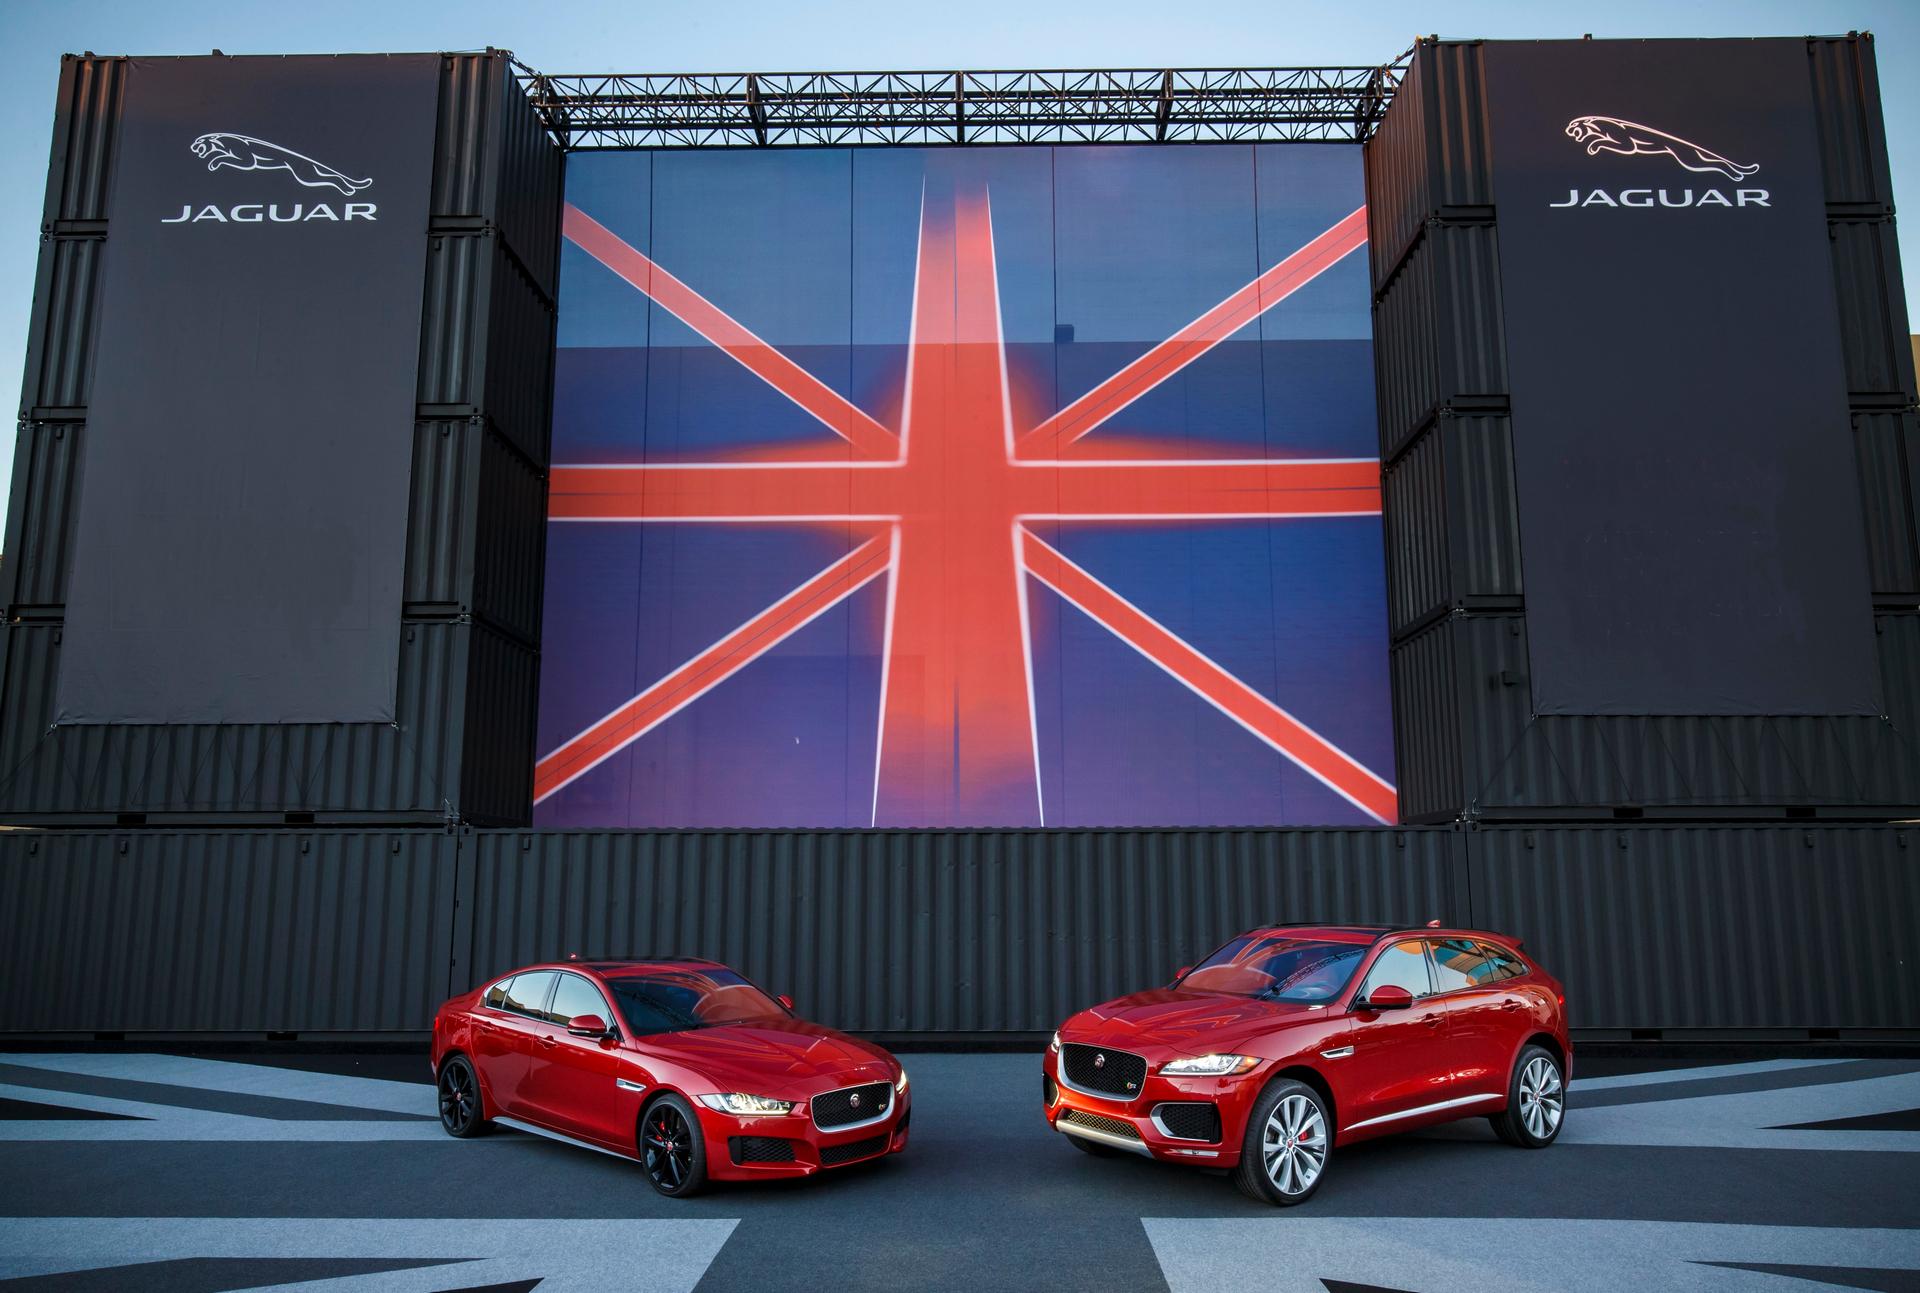 New Generation of Jaguar Models Arrive at Dealerships Across the Nation © Tata Group